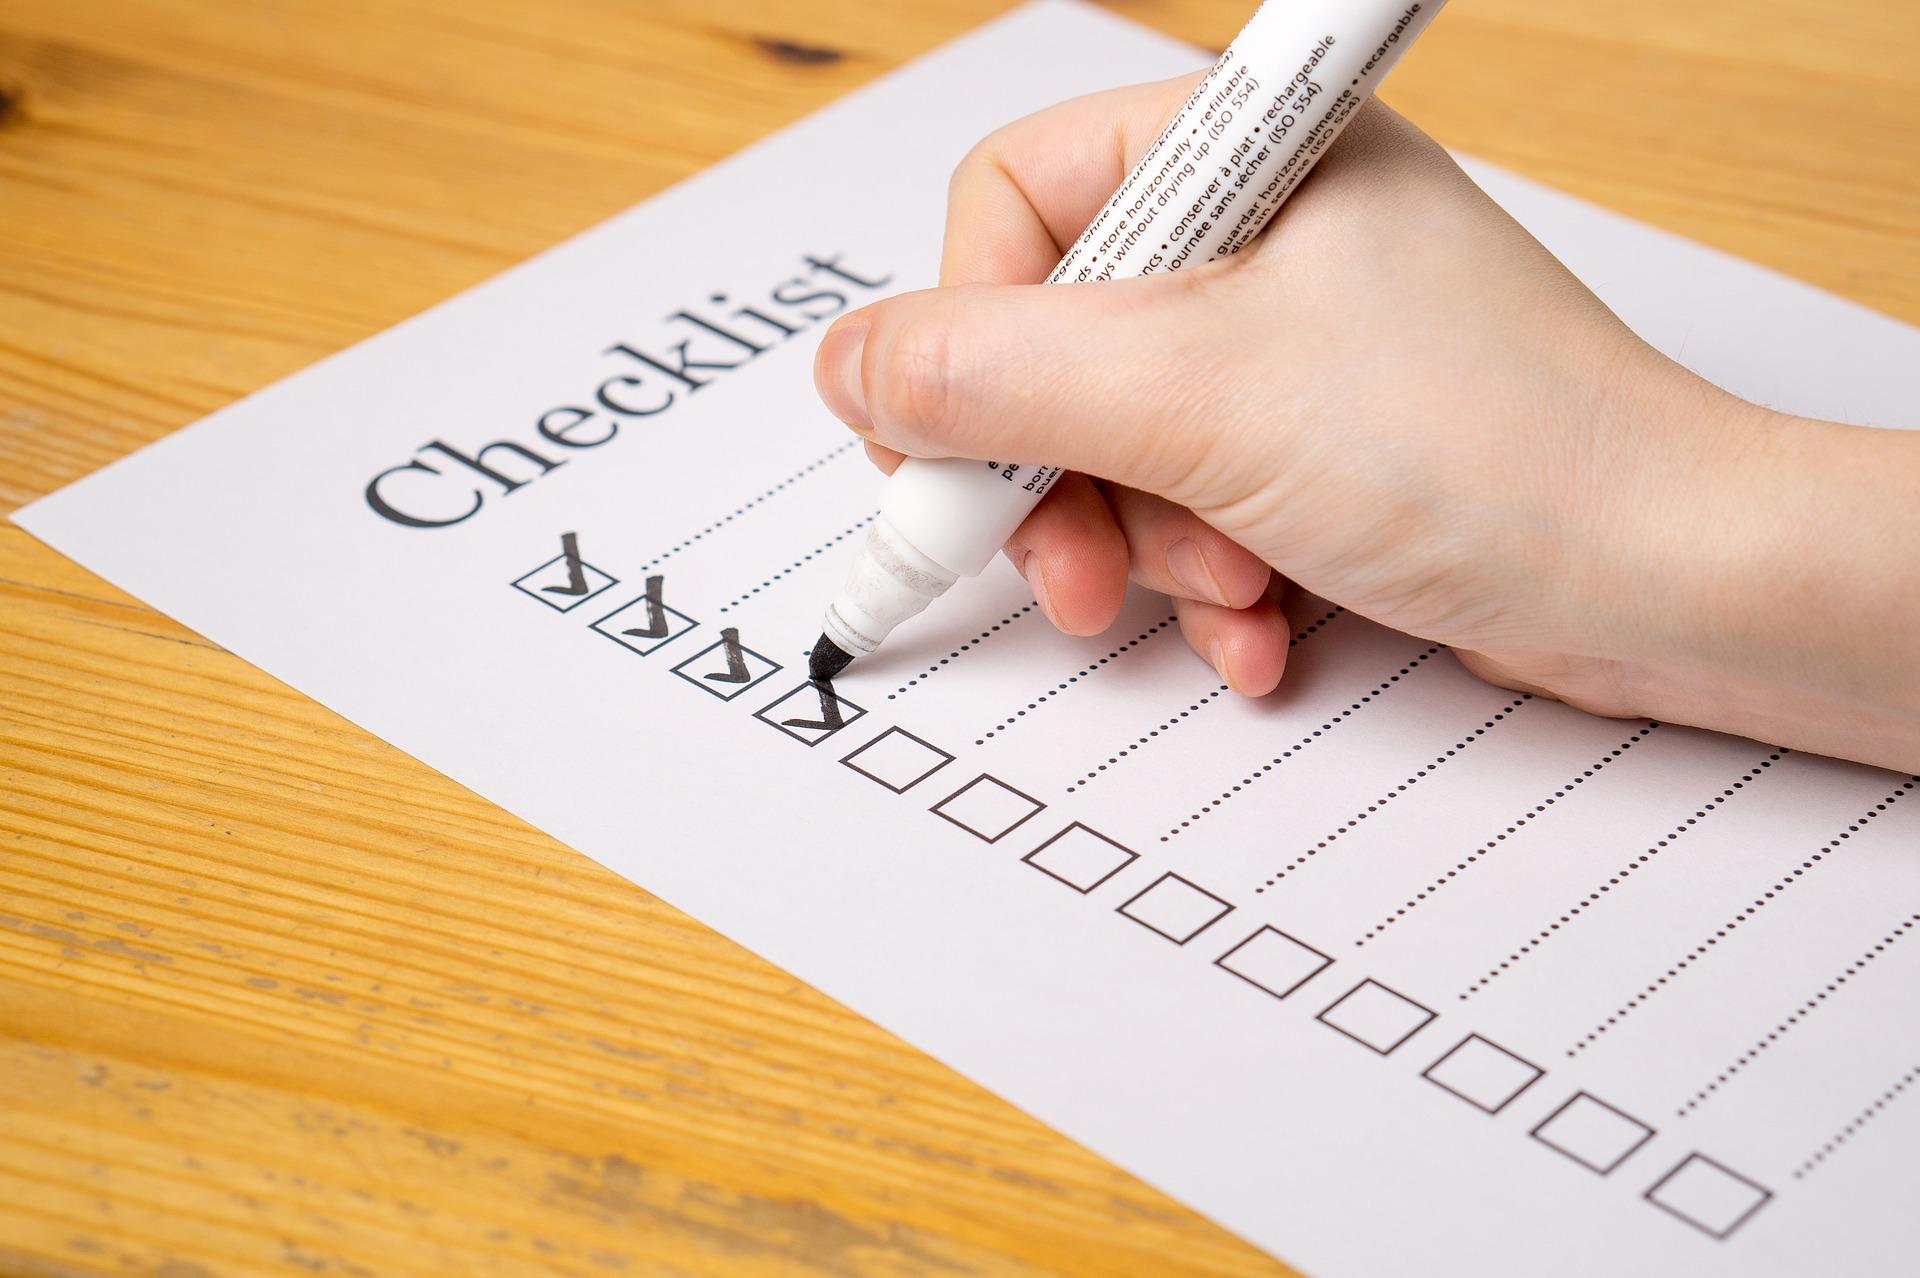 checklist-2077023_1920 (2)